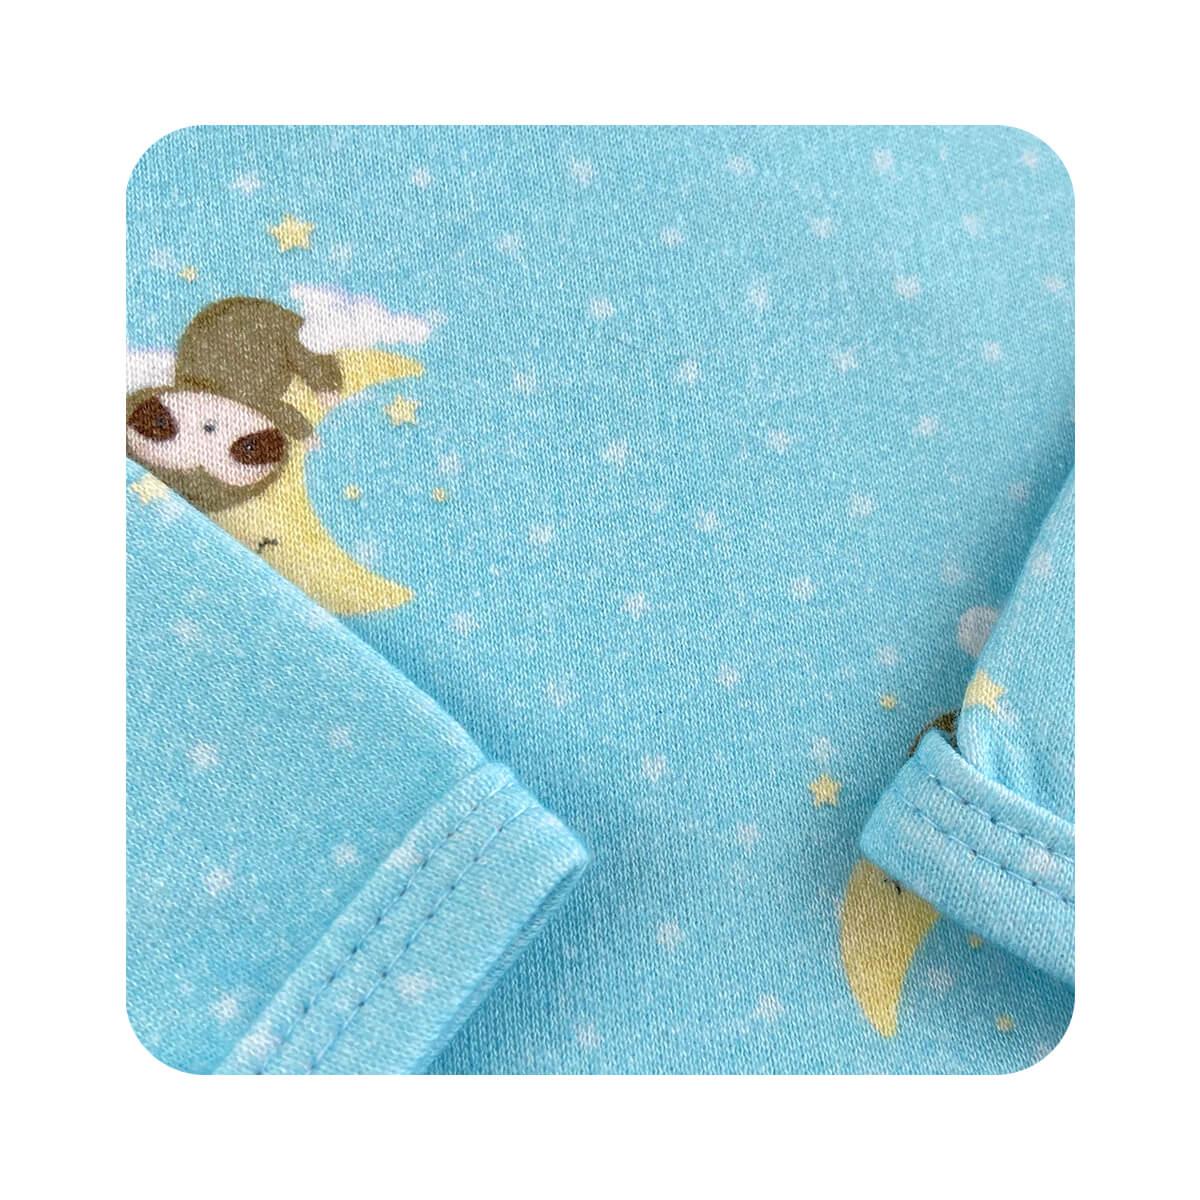 Sleeper Pezinho Reversível Preguiça  - Piu Blu